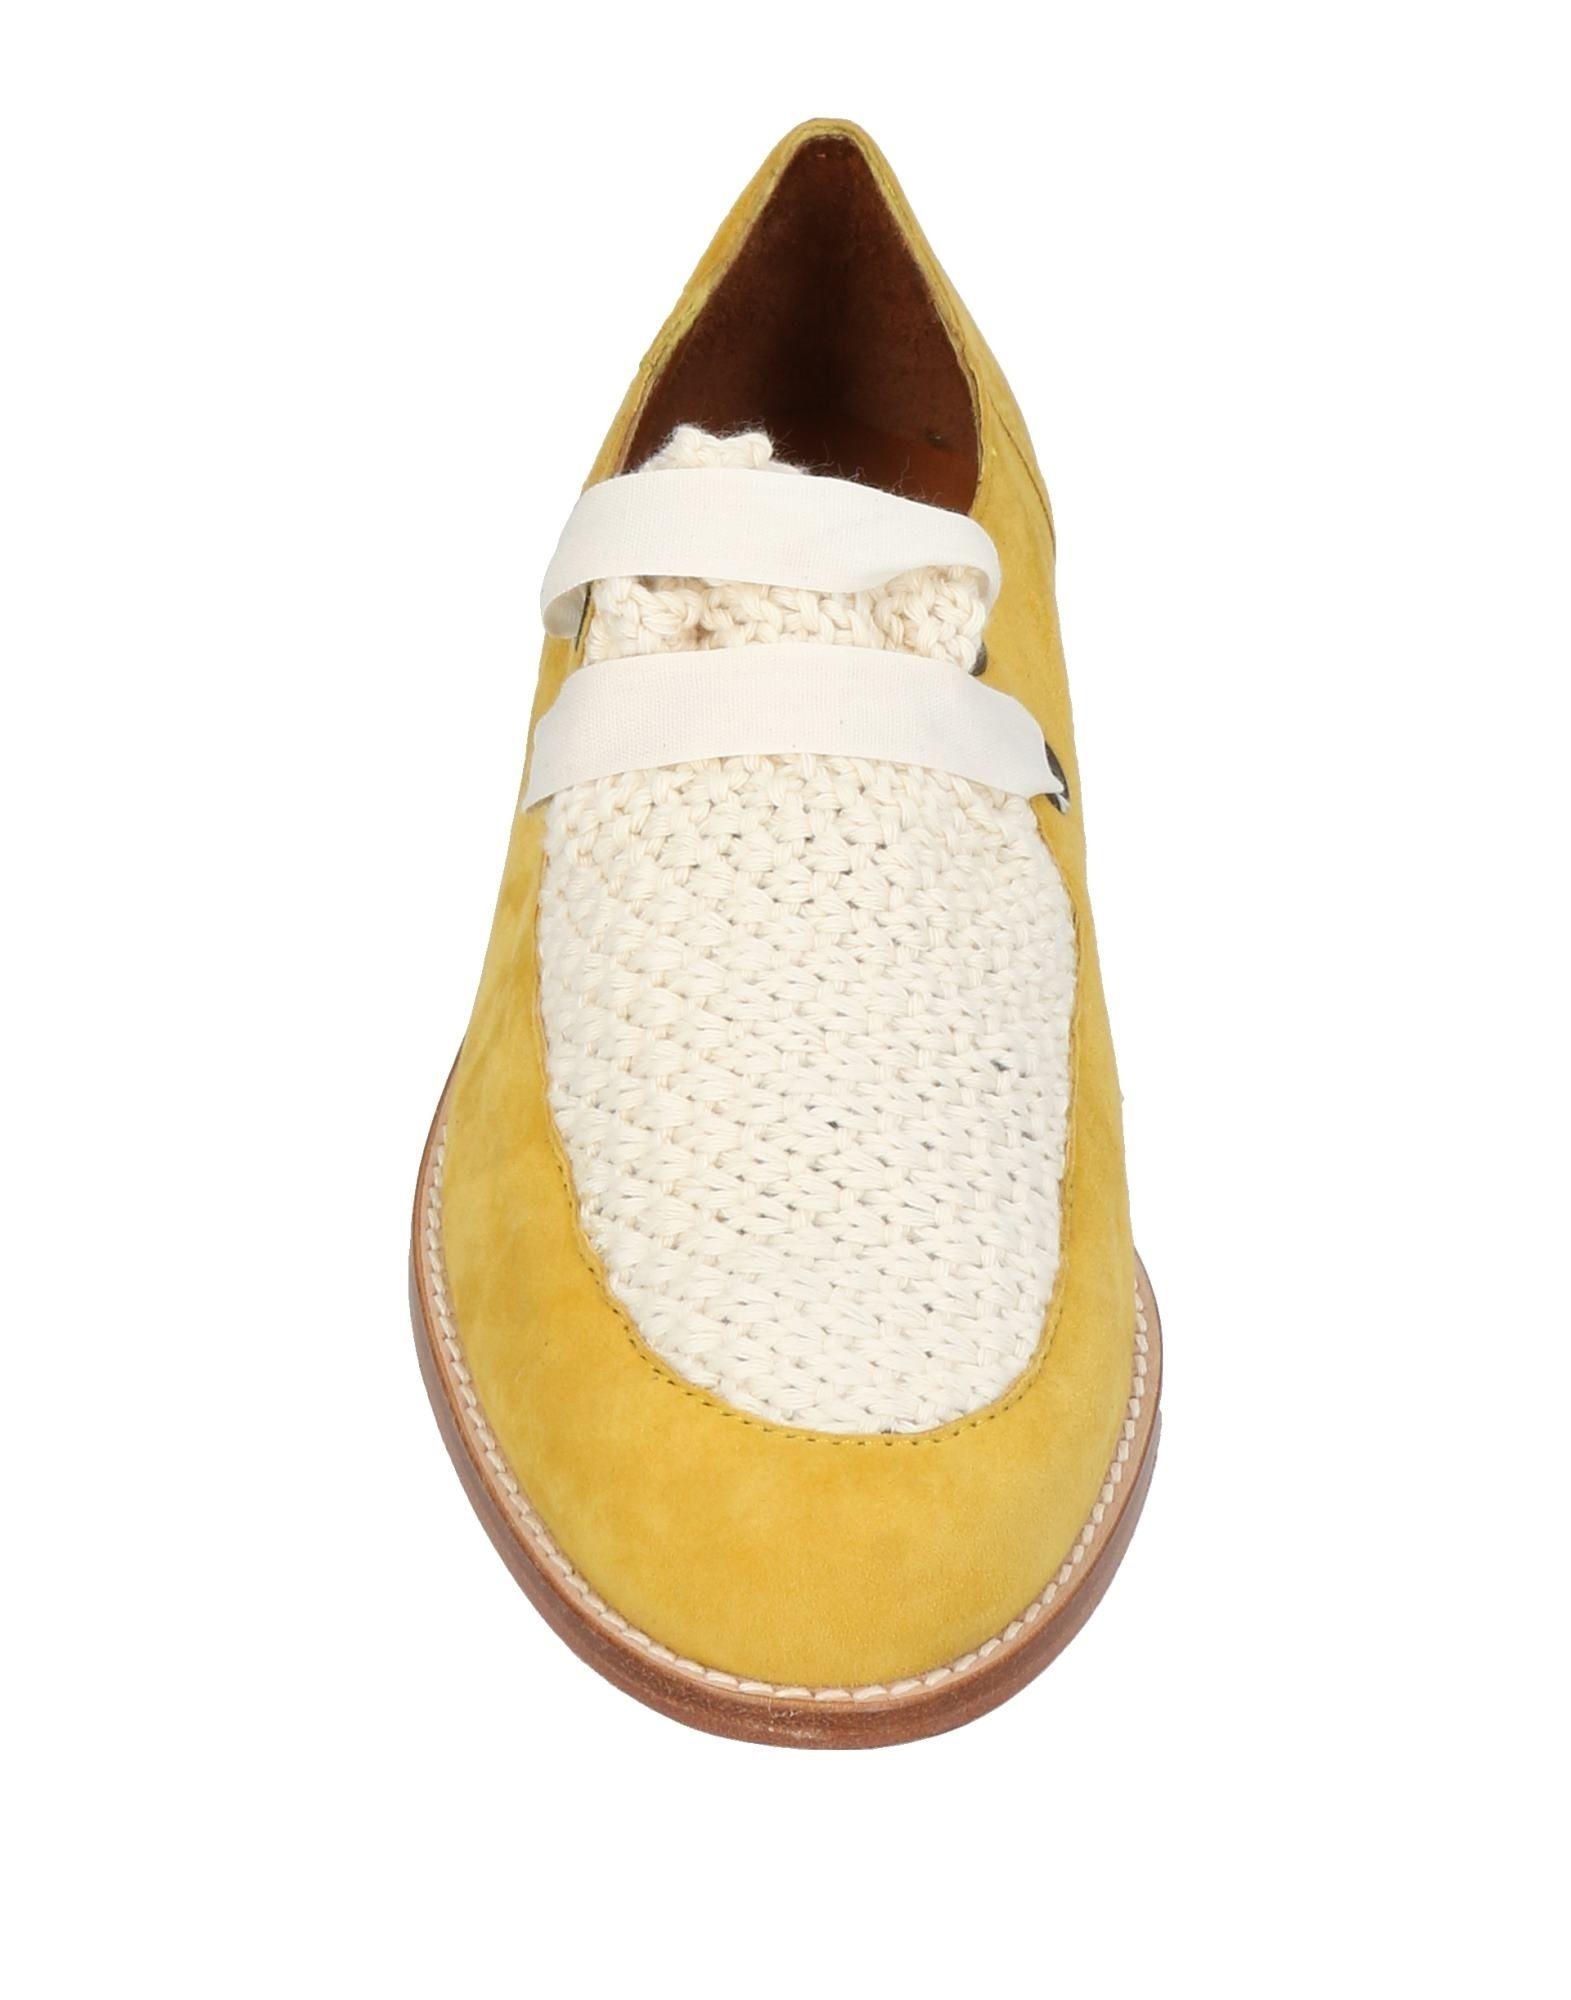 Chaussures - Tribunaux Naguisa tK8G3WXa1d